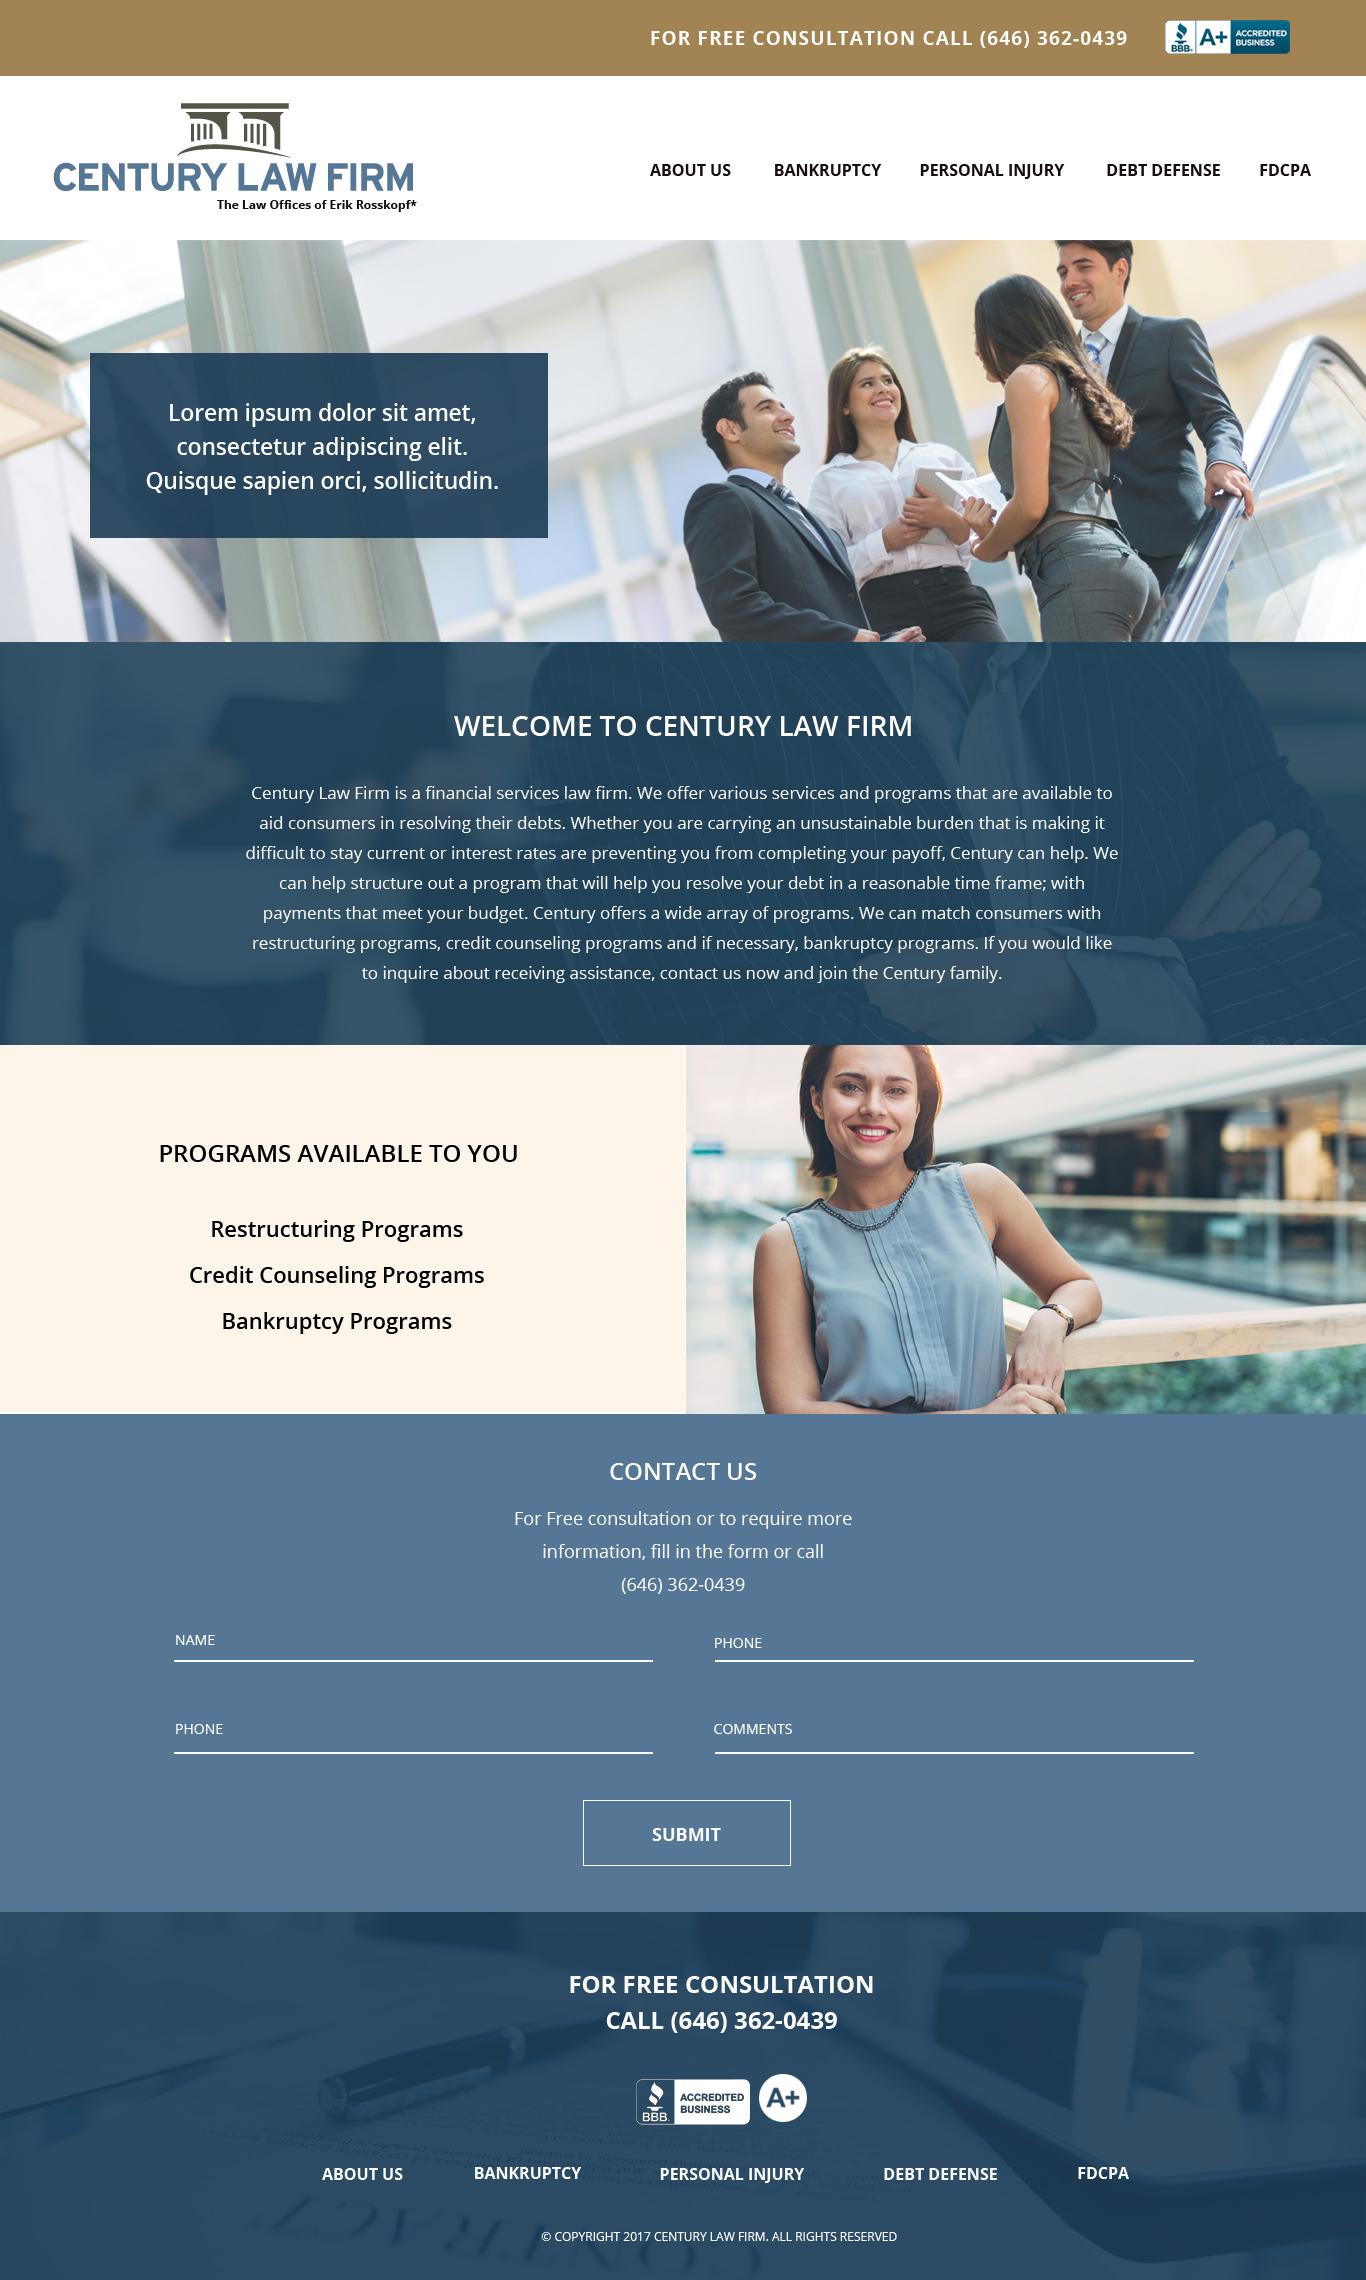 1-Centrury-Law-Desktop-Homepage .jpg